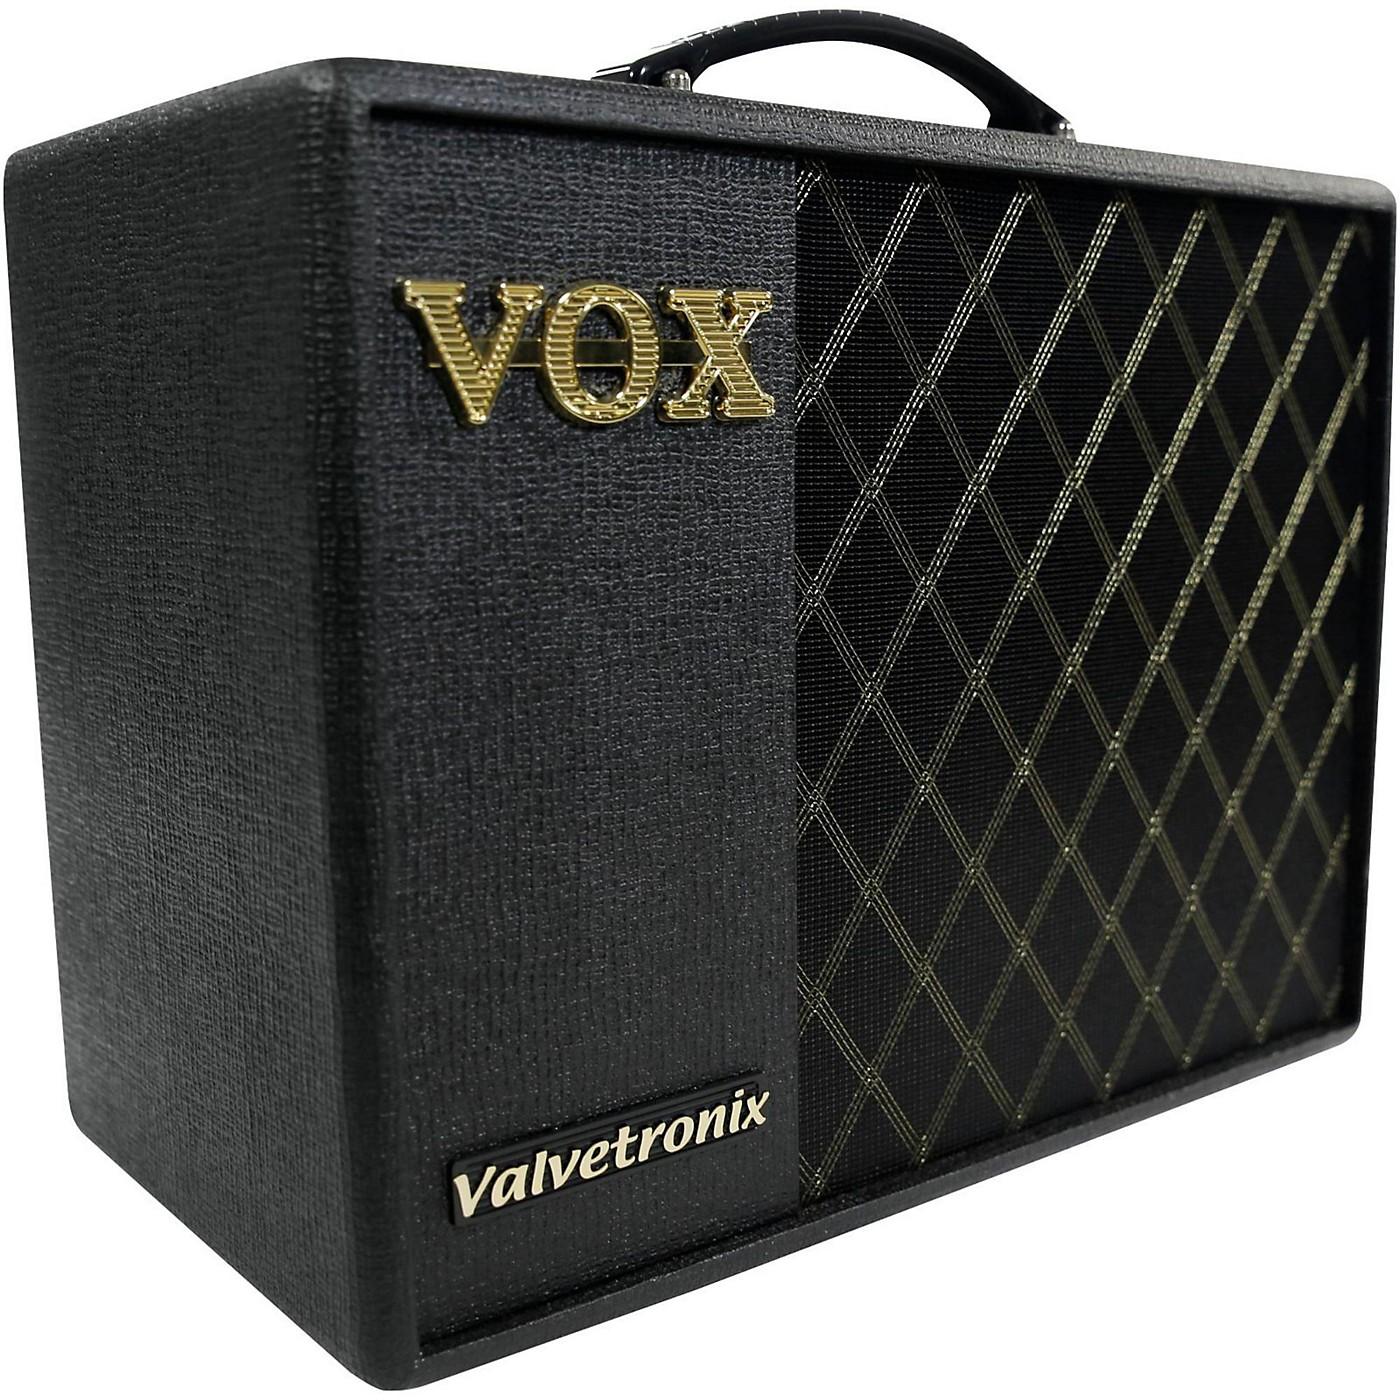 Vox Valvetronix VT20X 20W 1x8 Guitar Modeling Combo Amp thumbnail